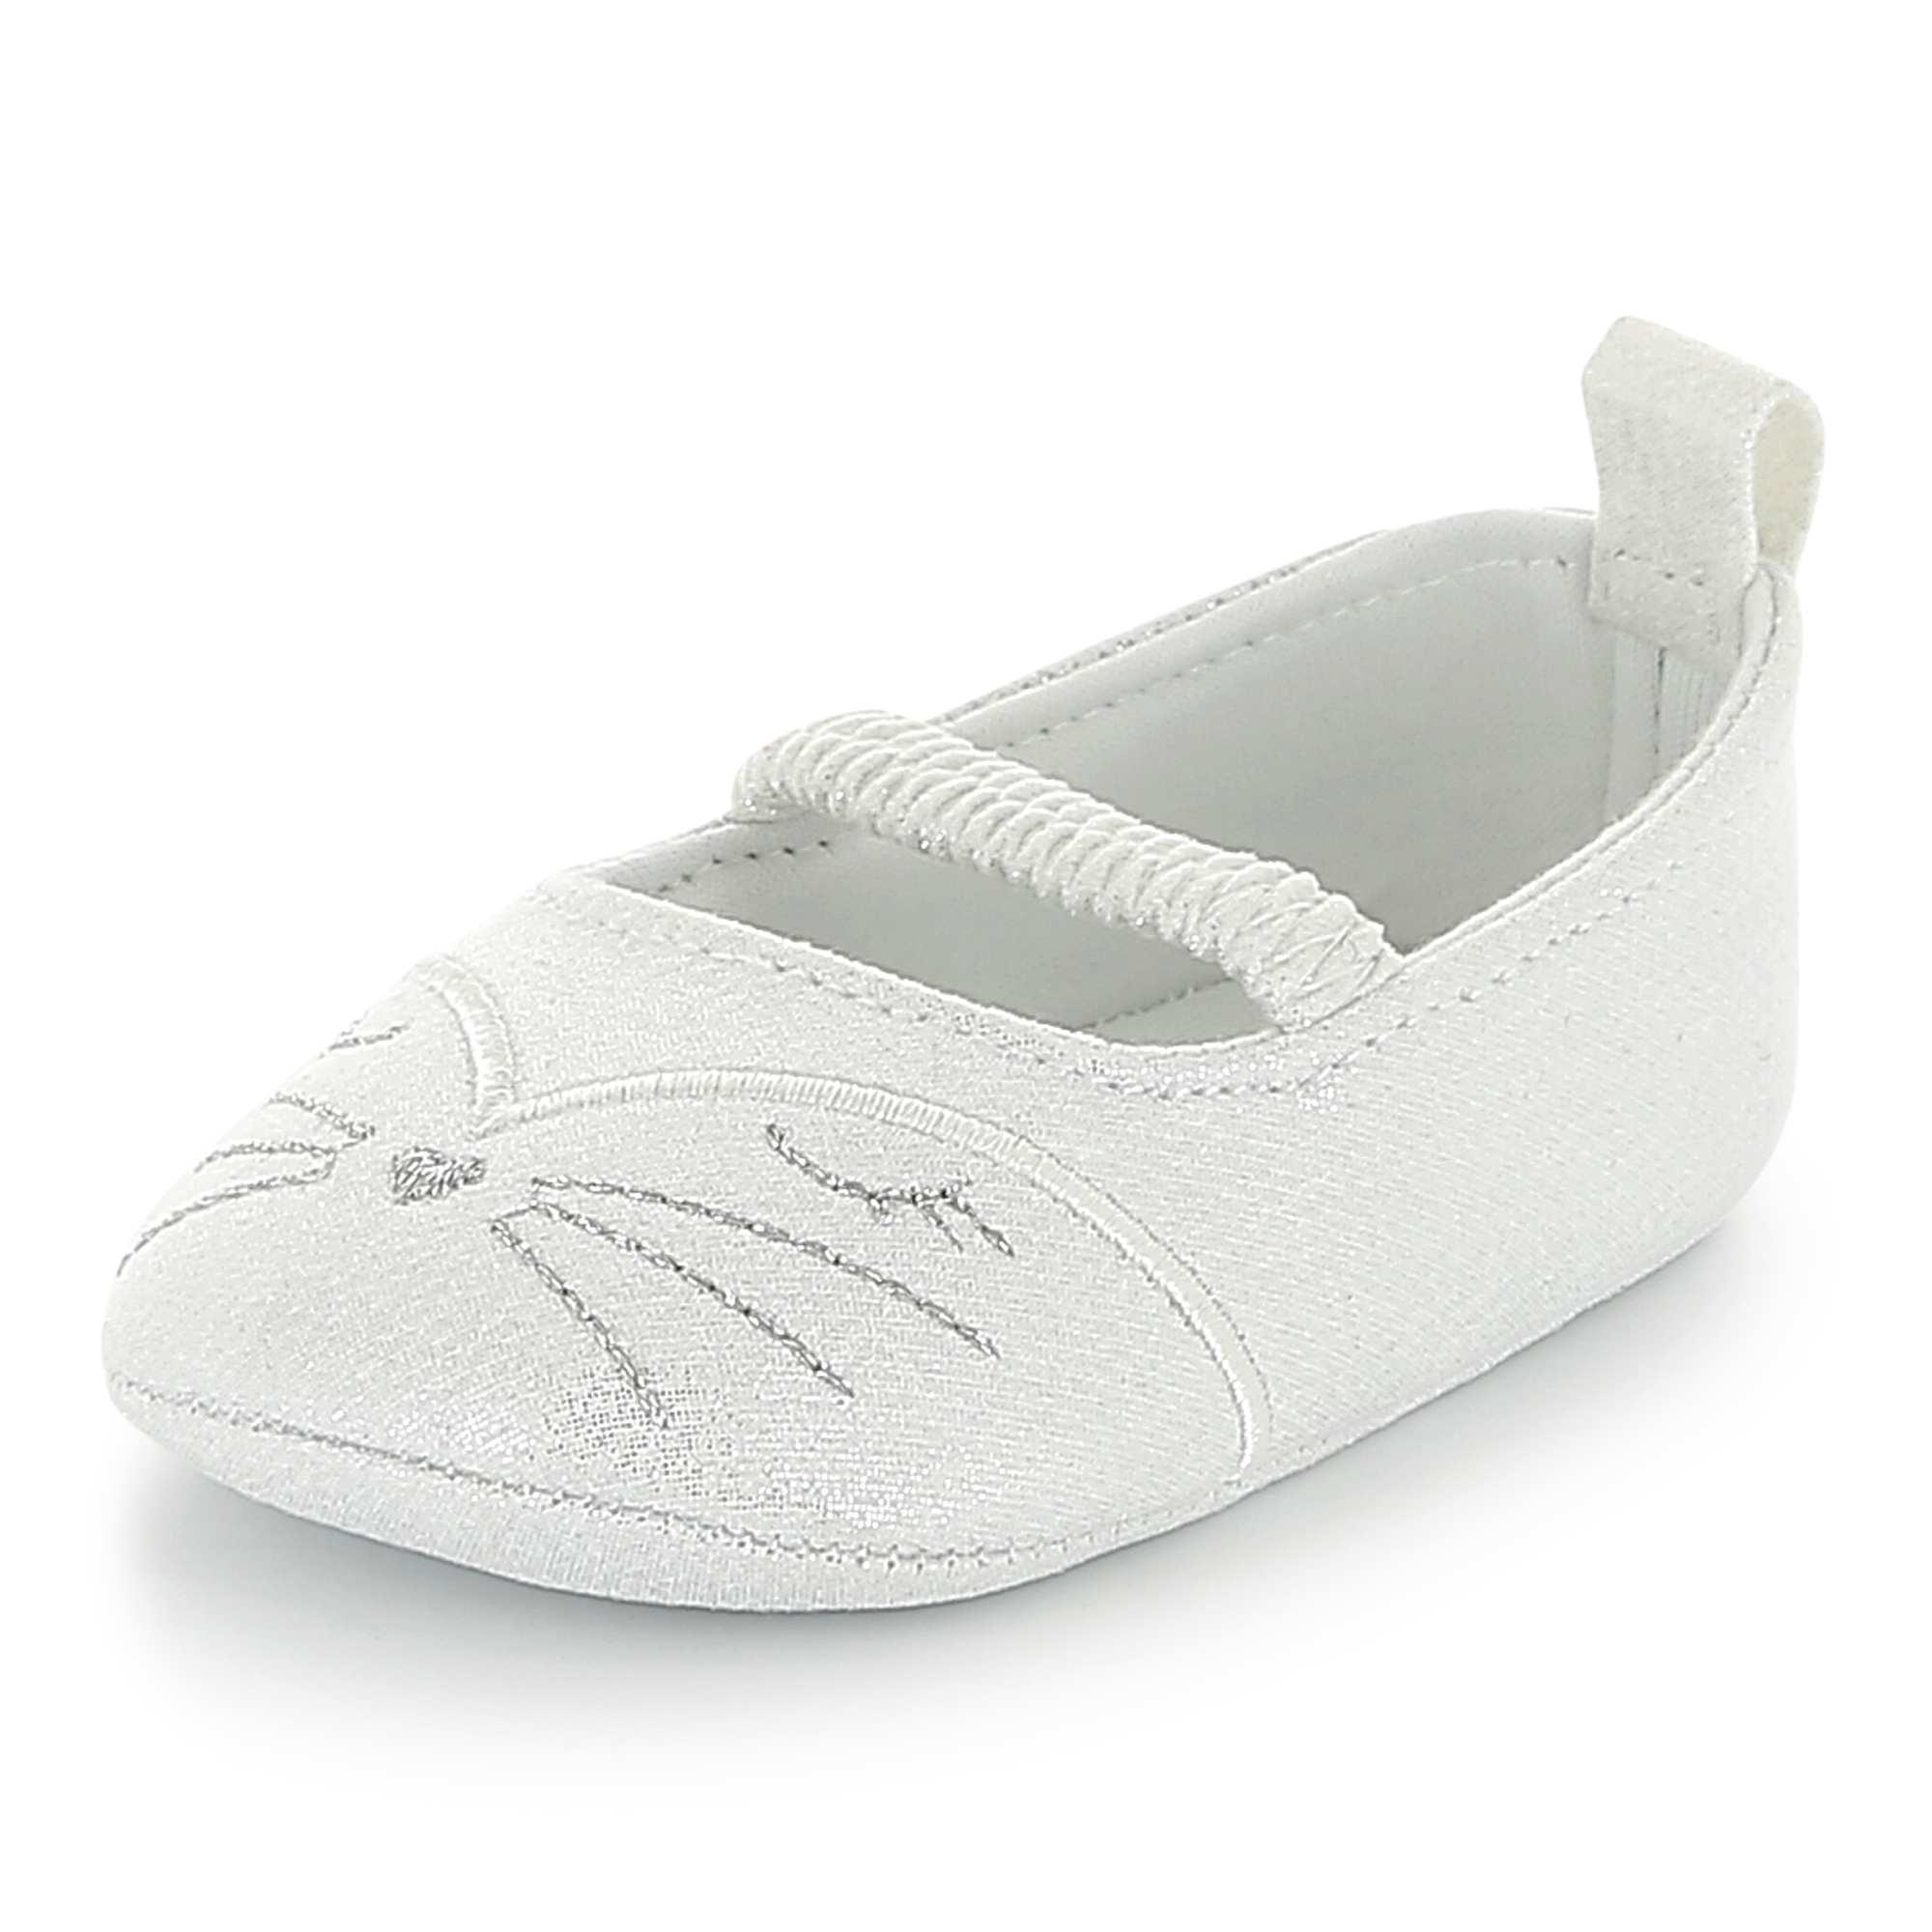 3458a10925a88 Ballerine petite fille kiabi - Chaussure - lescahiersdalter